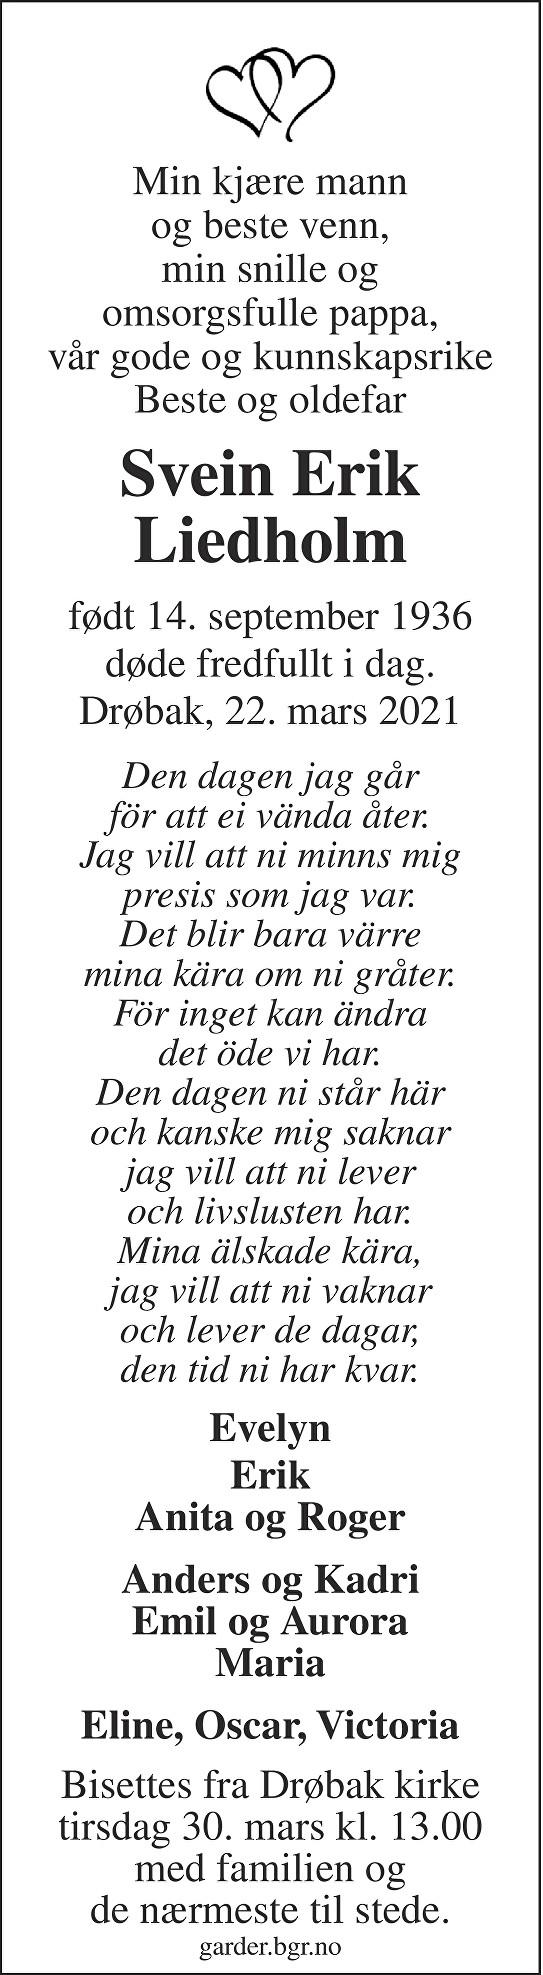 Svein Erik Liedholm Dødsannonse